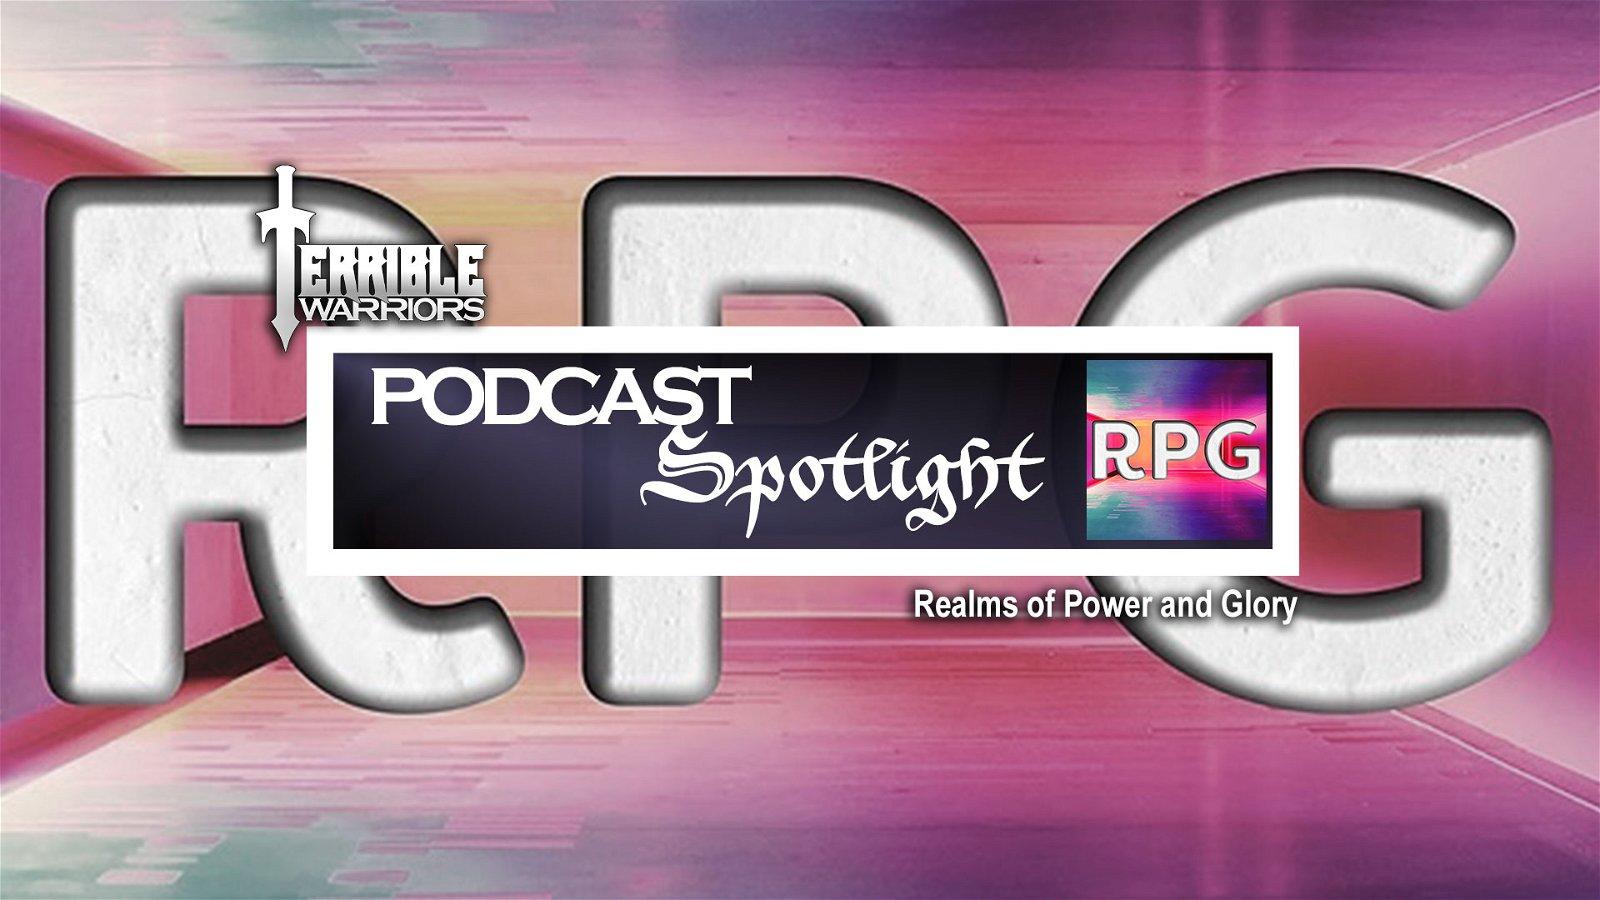 Terrible Warriors Podcast Spotlight: Realms of Peril & Glory